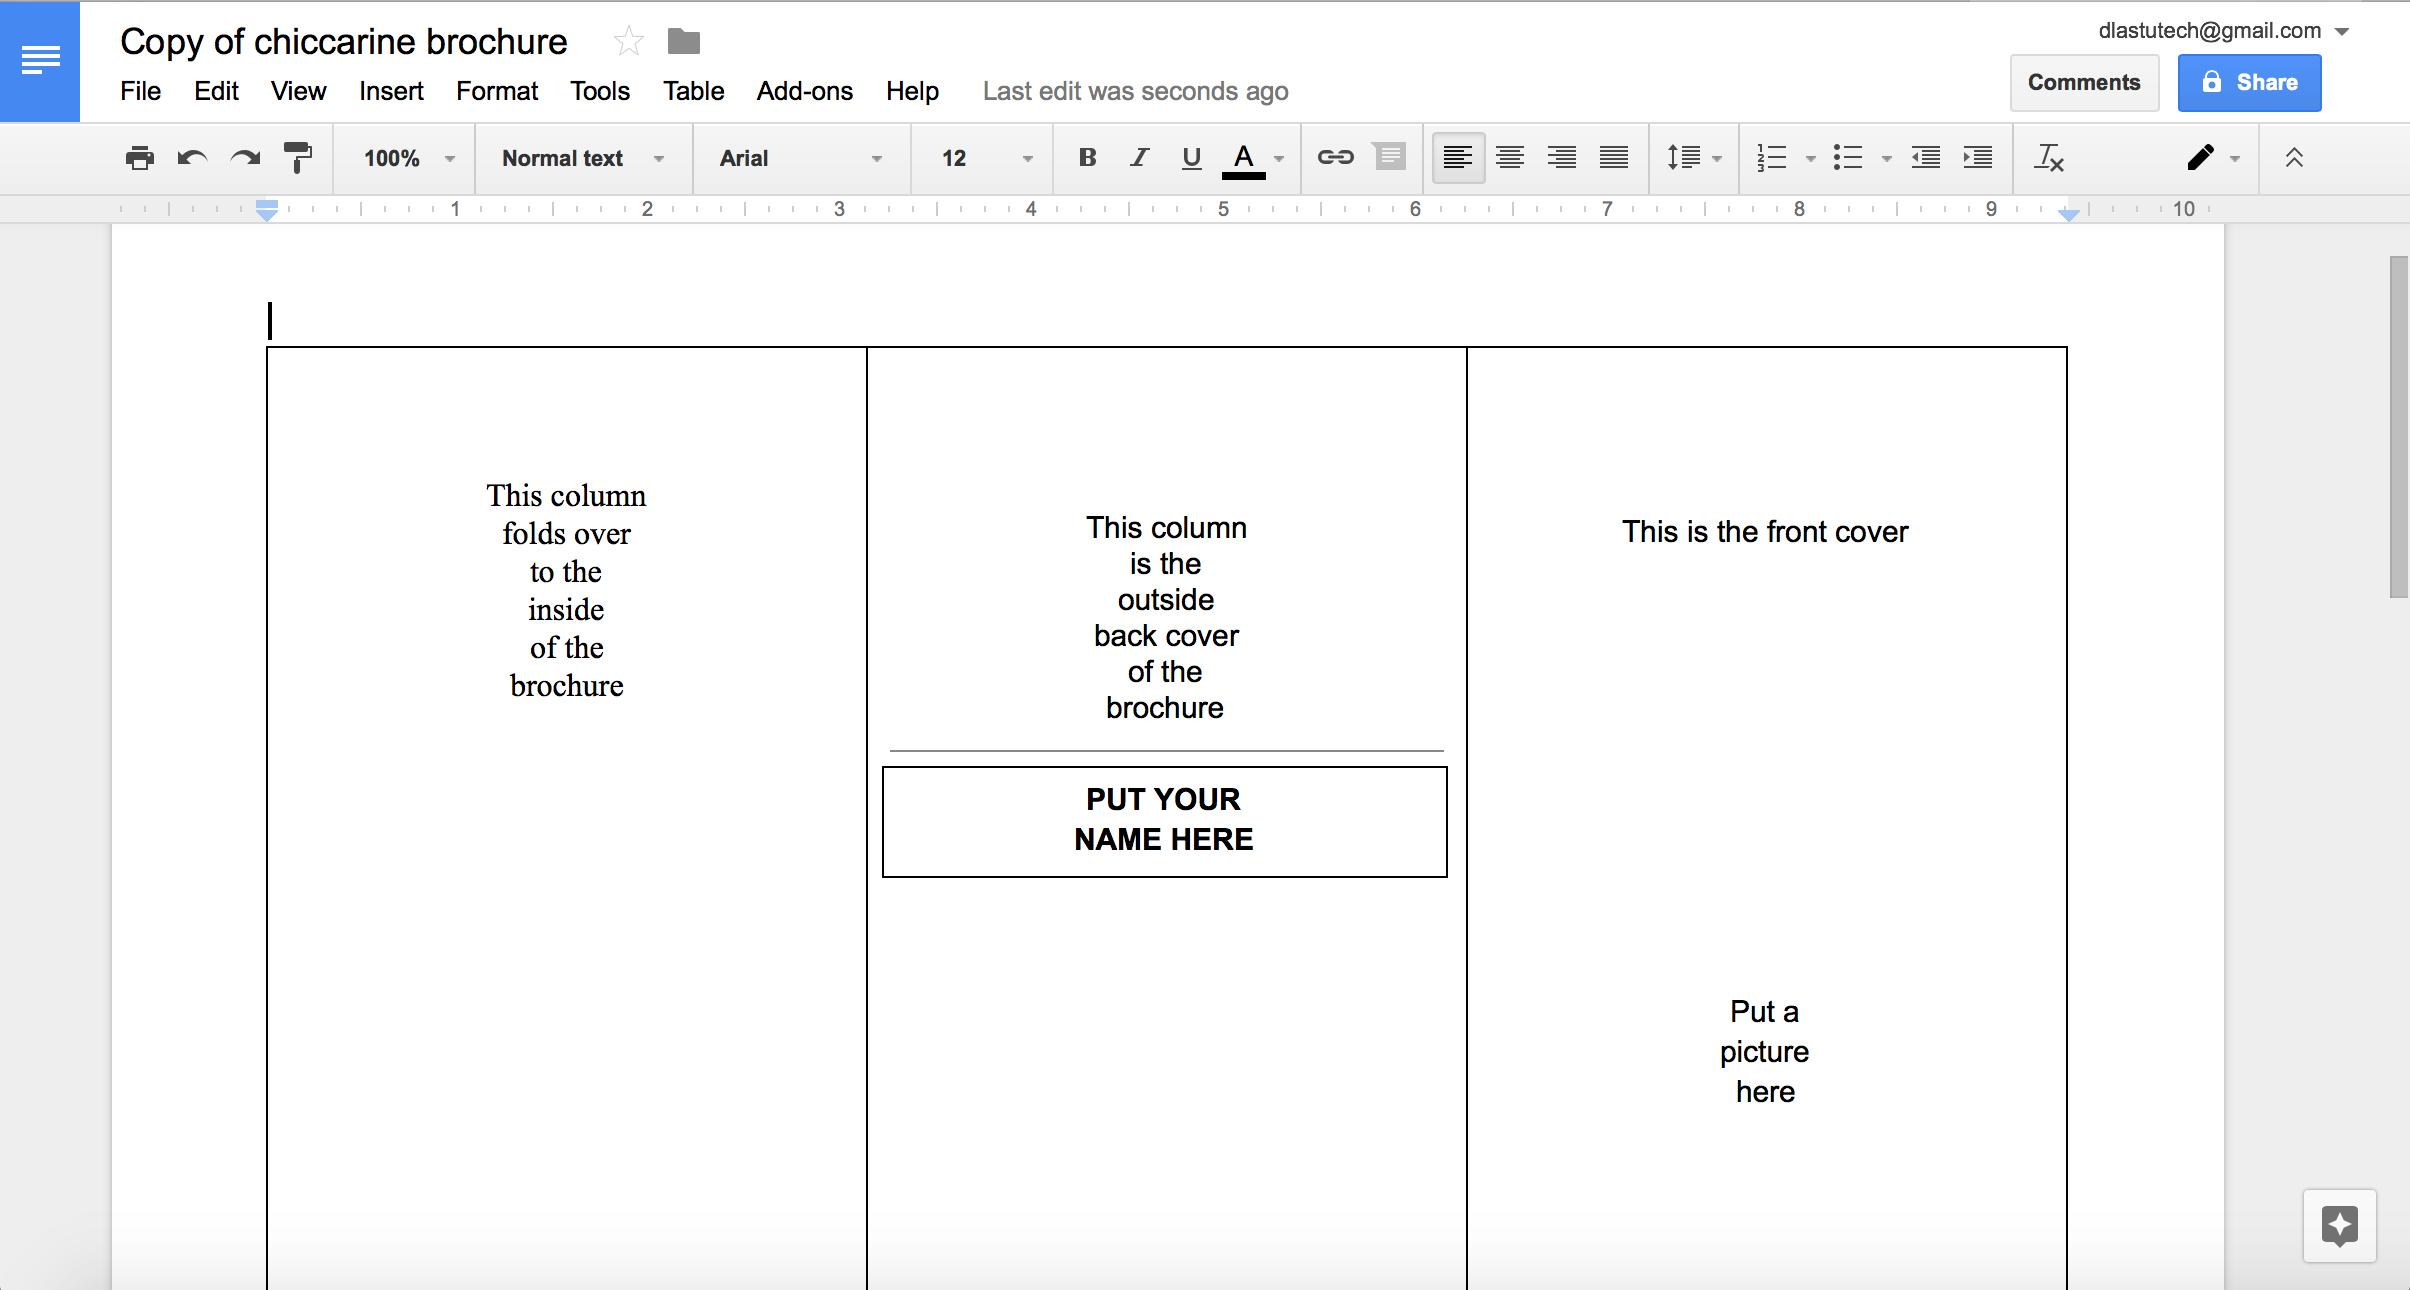 007 Tri Fold Template Google Docs Brochure Templates Luxury With Regard To Brochure Template Google Docs